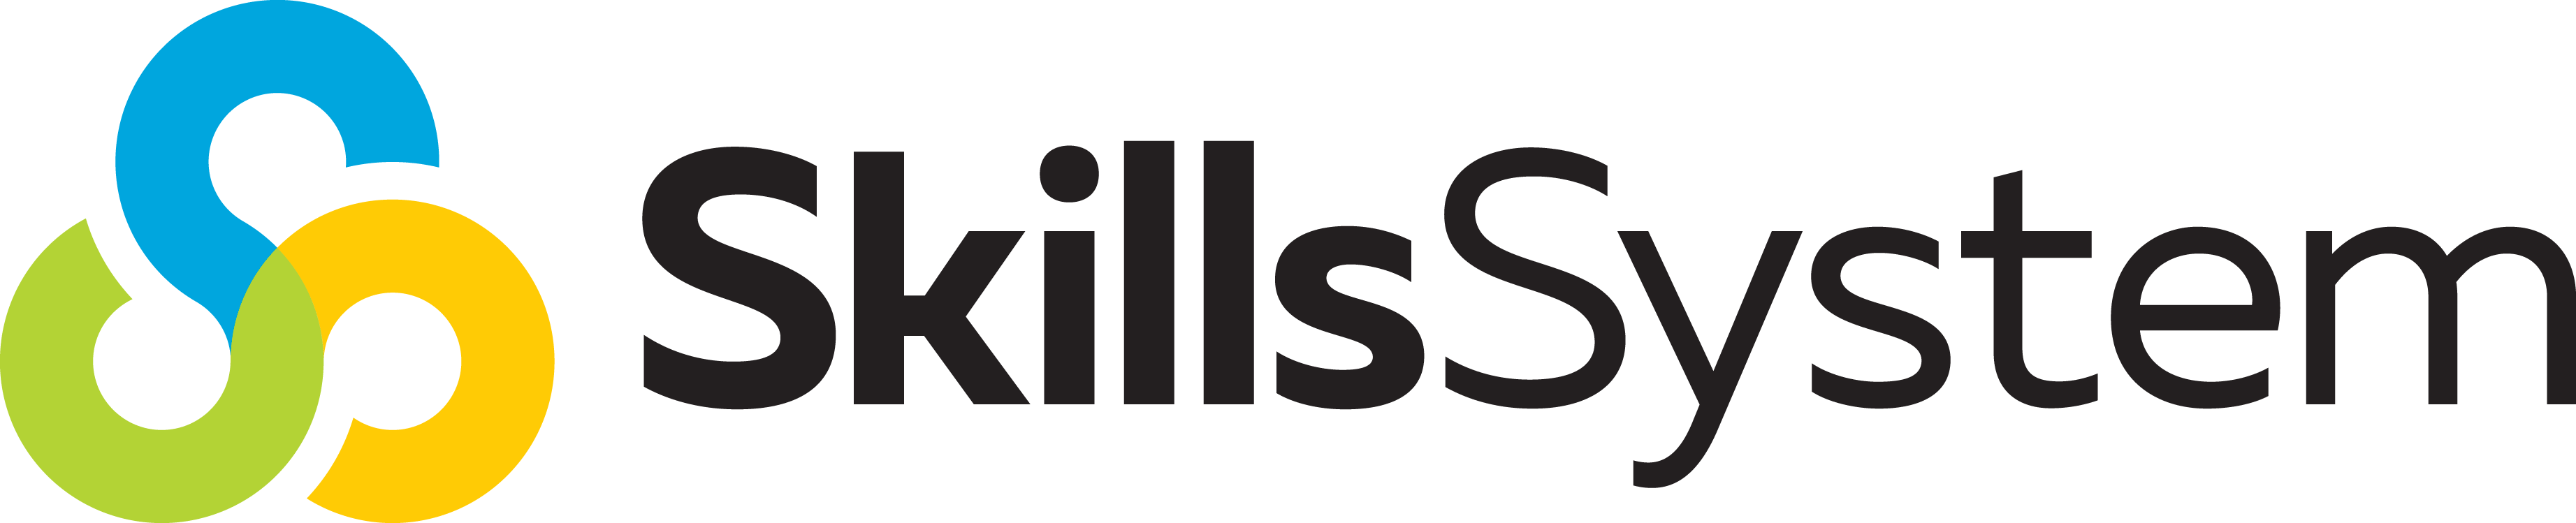 Members Skills System